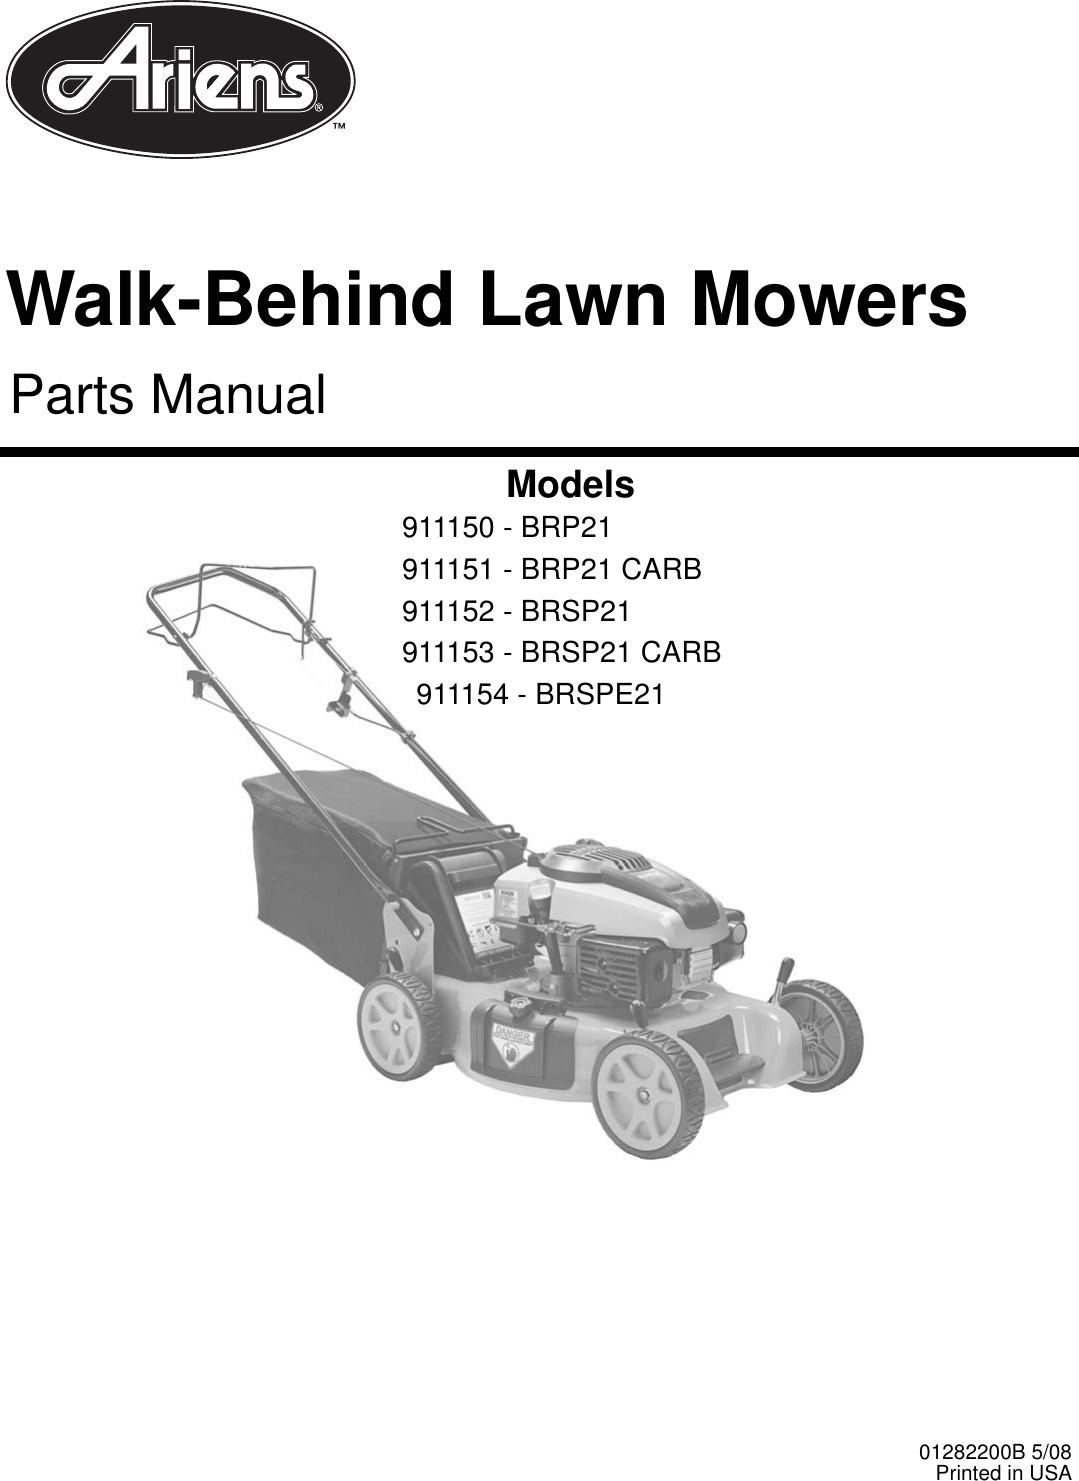 Ariens 911150 Brp21 Users Manual 01282200_Ariens WBLM PM